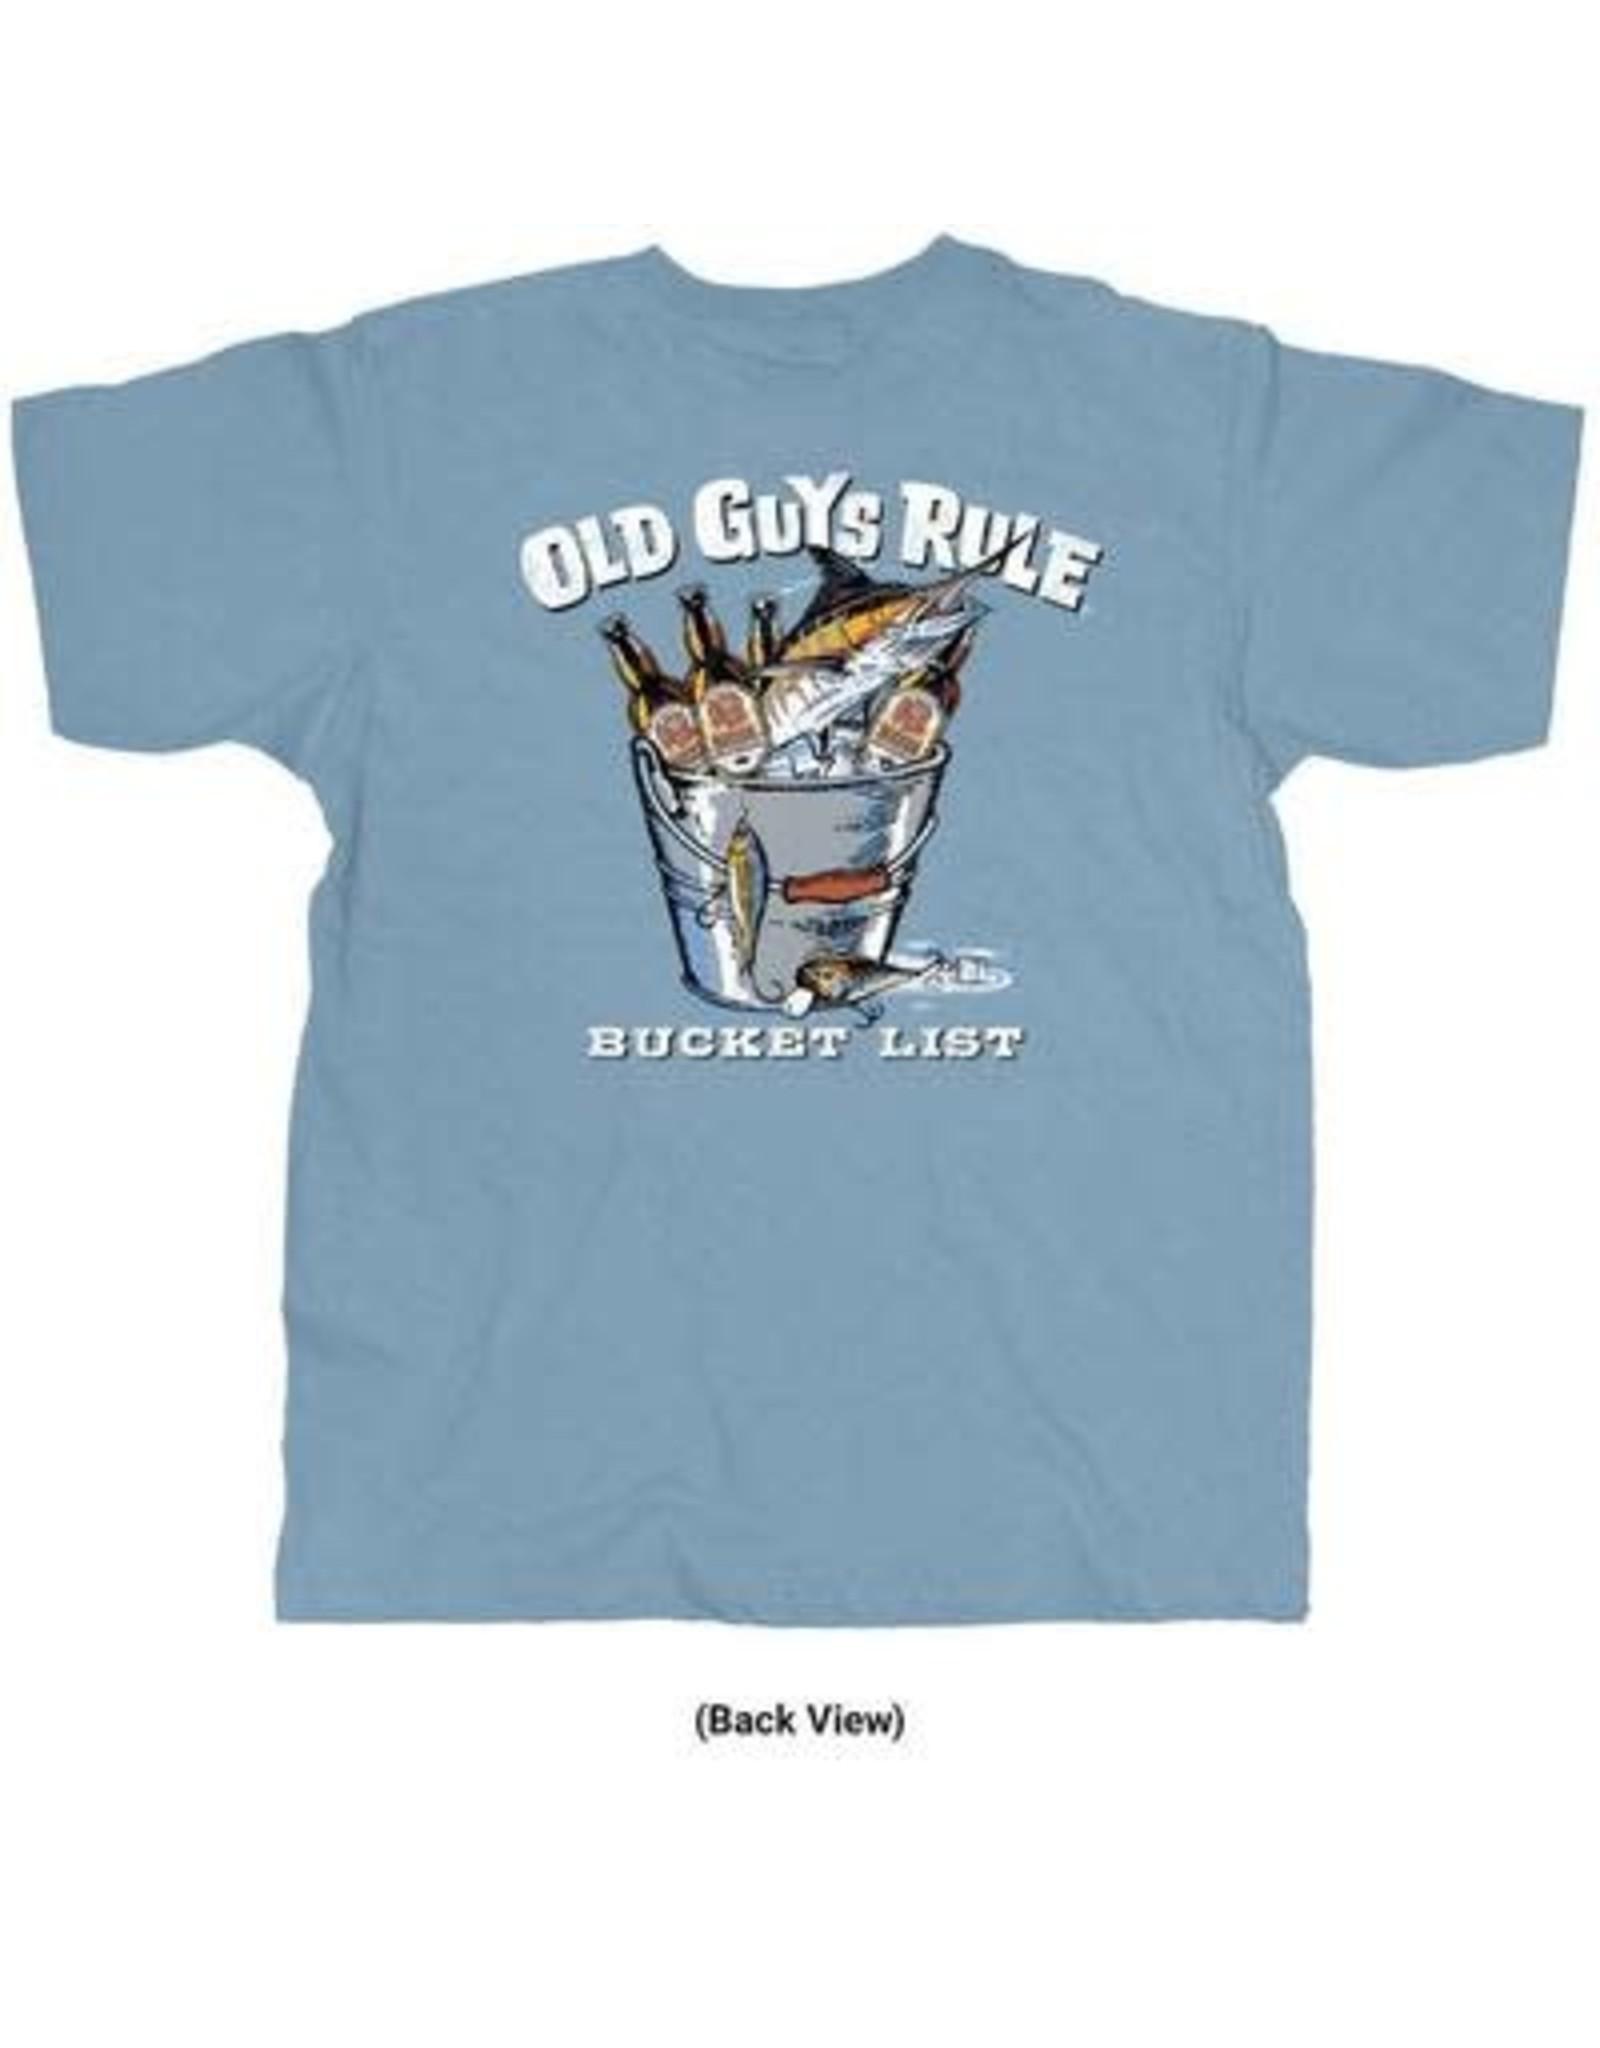 OLD GUYS RULE OLD GUYS RULE BUCKET LIST SS TEE